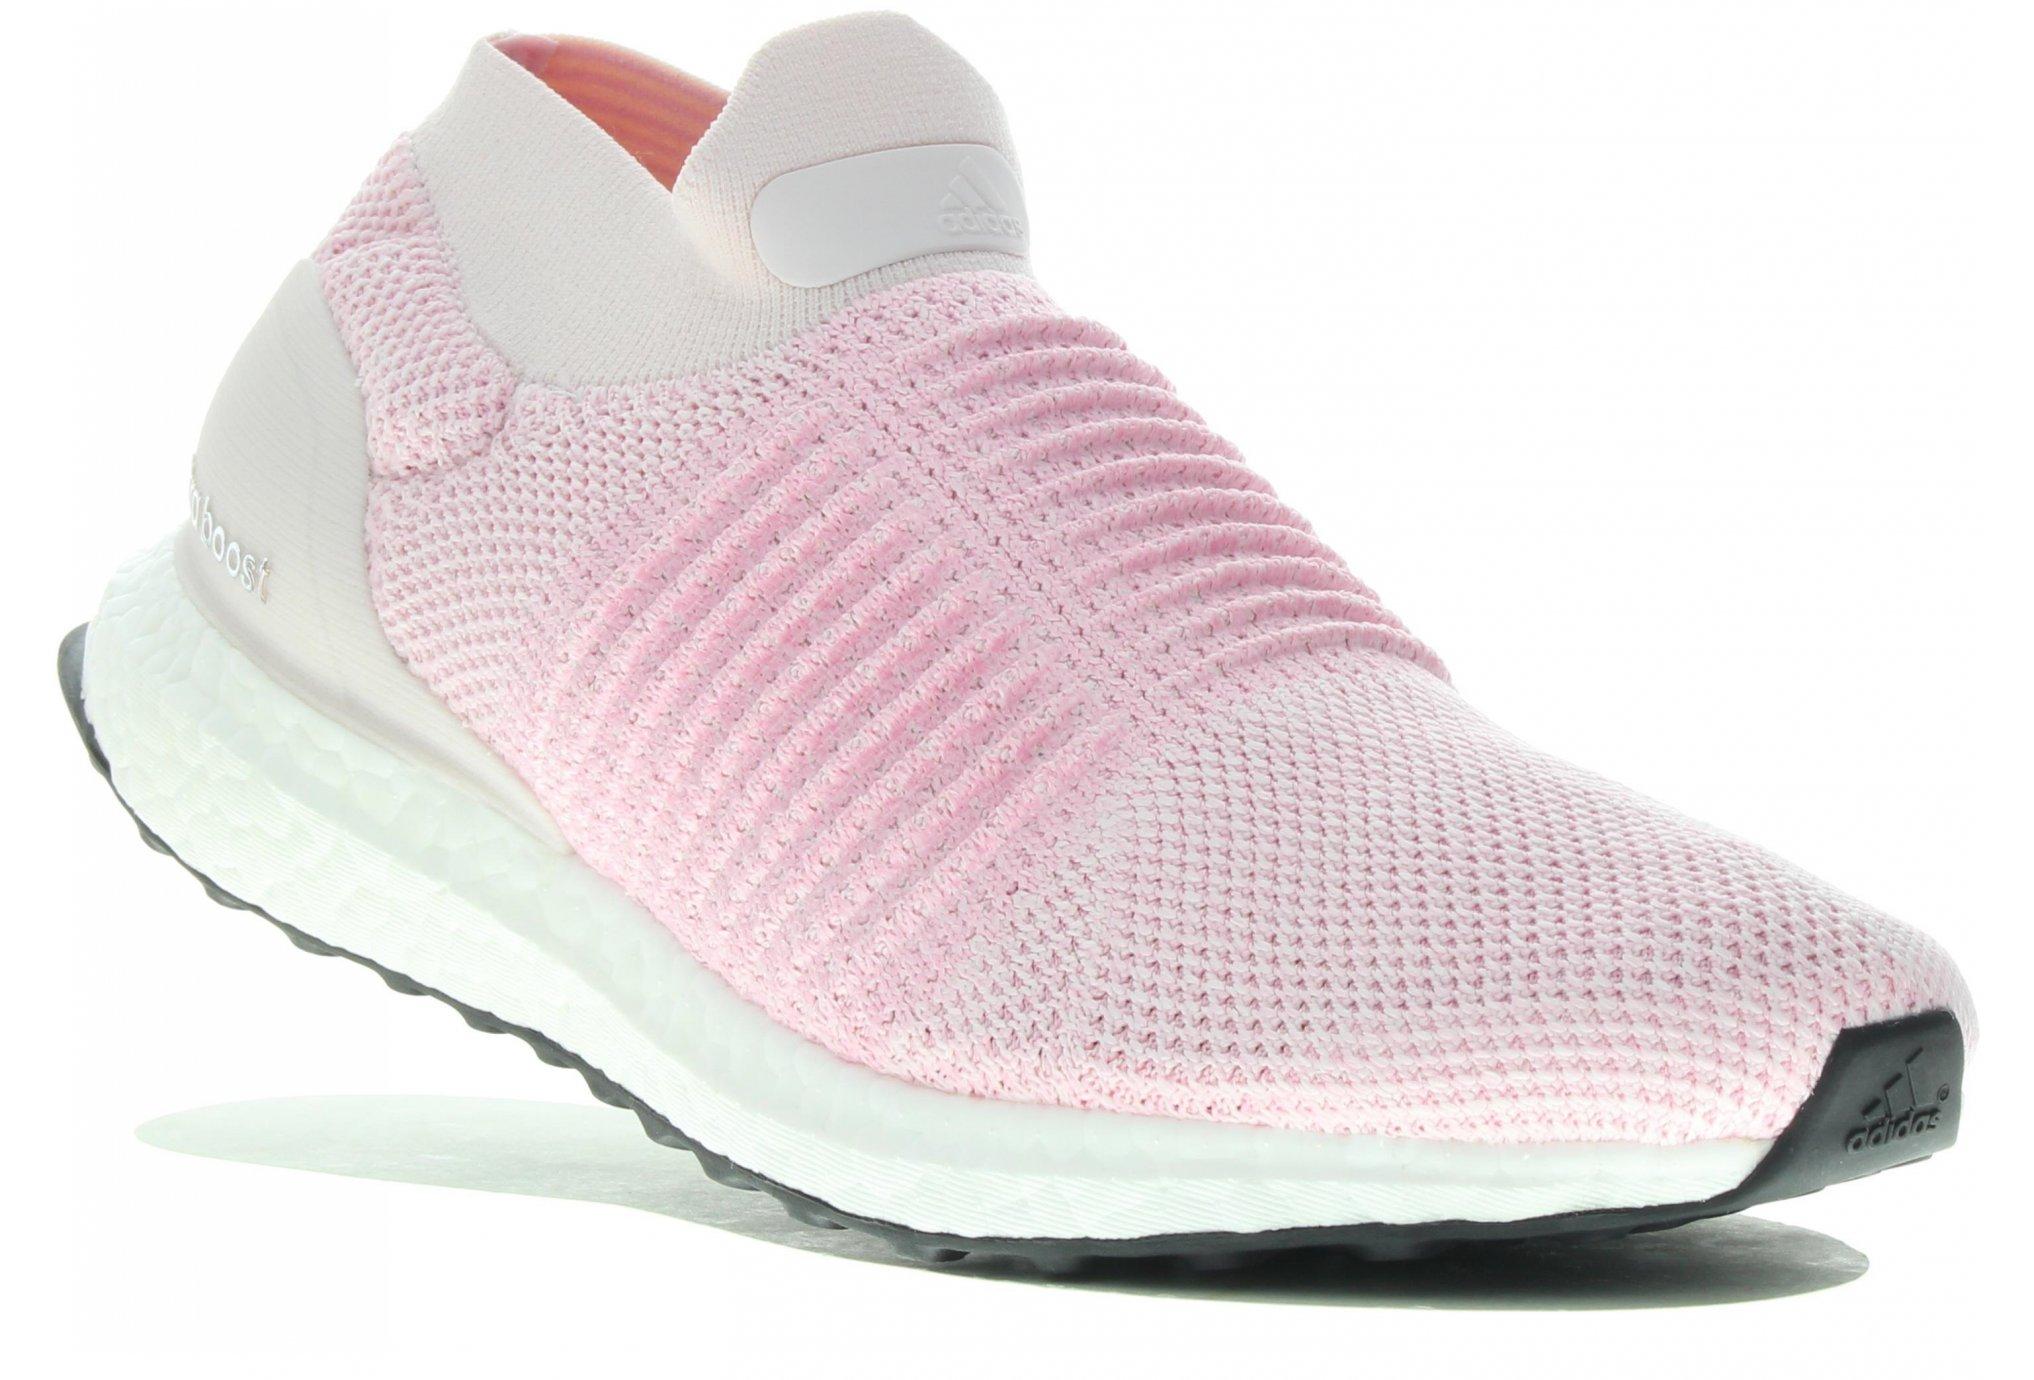 adidas-ultraboost-laceless-w-chaussures-running-femme-284836-1-fz